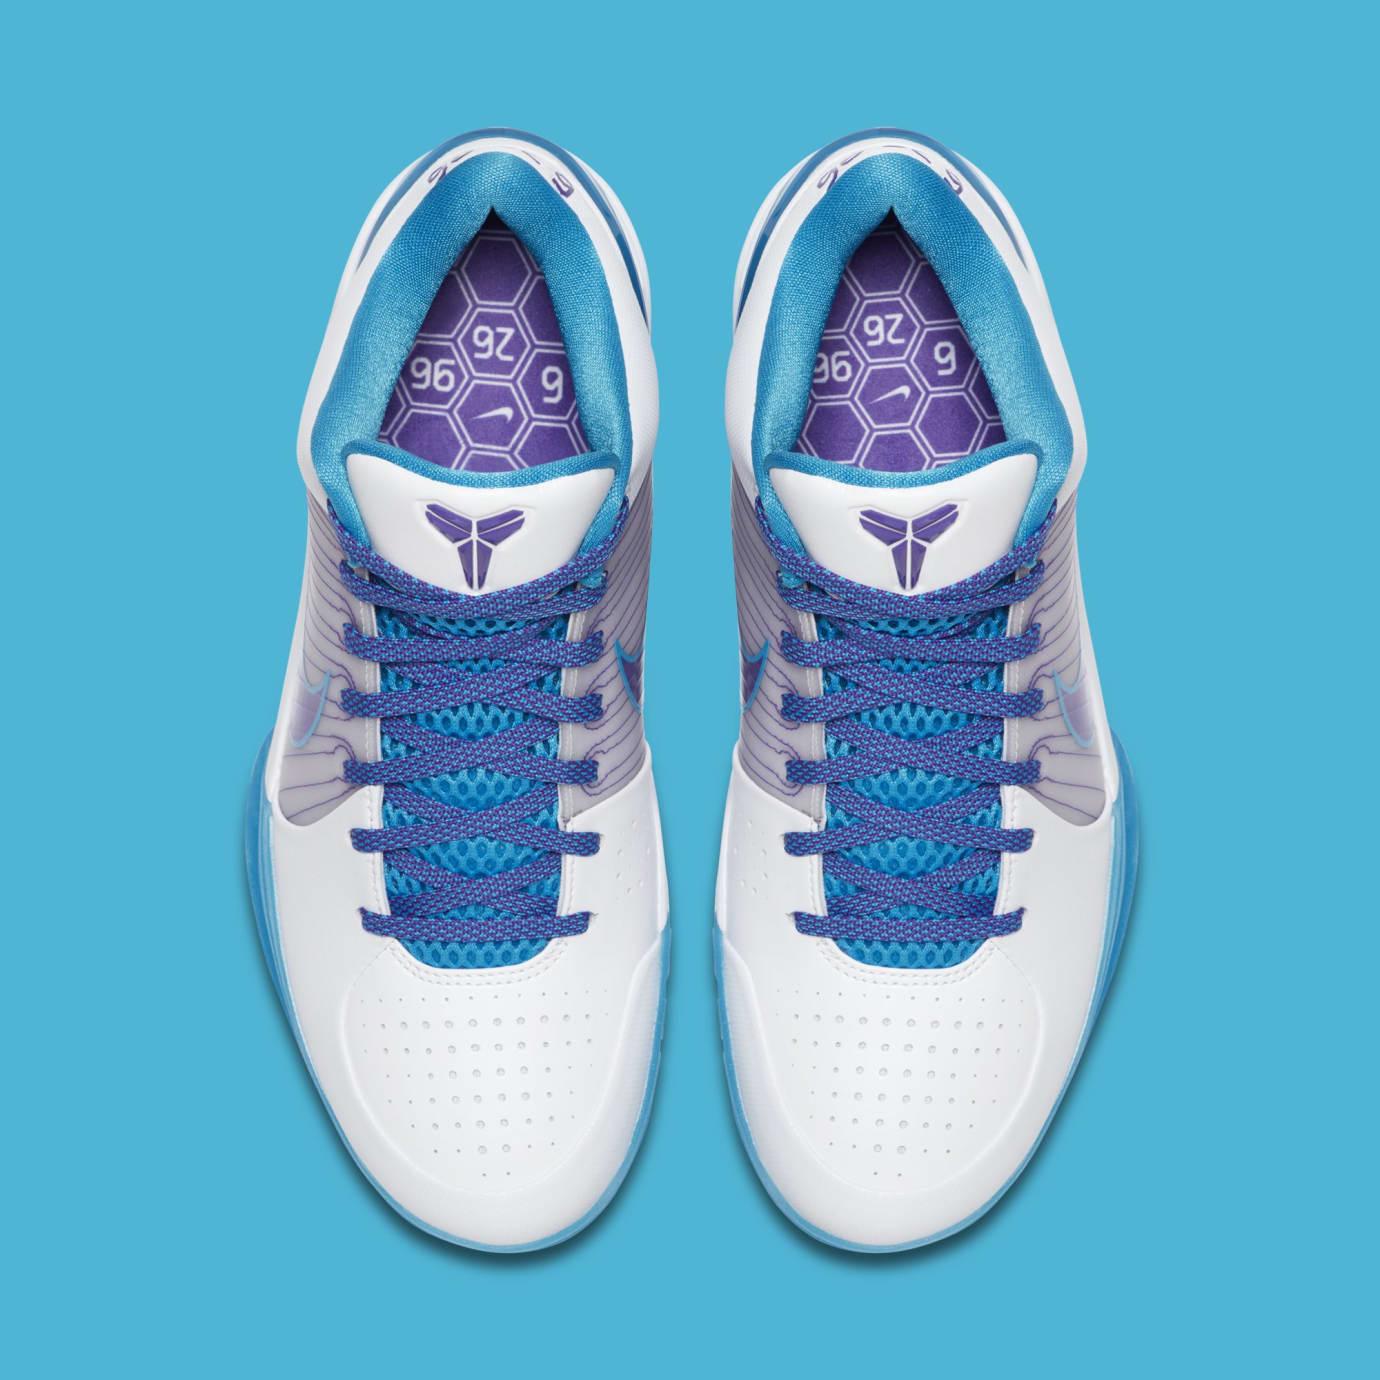 5c5380a31d5f Image via Nike Nike Kobe 4 Protro  White Orion Blue-Varsity Purple   AV6339-100